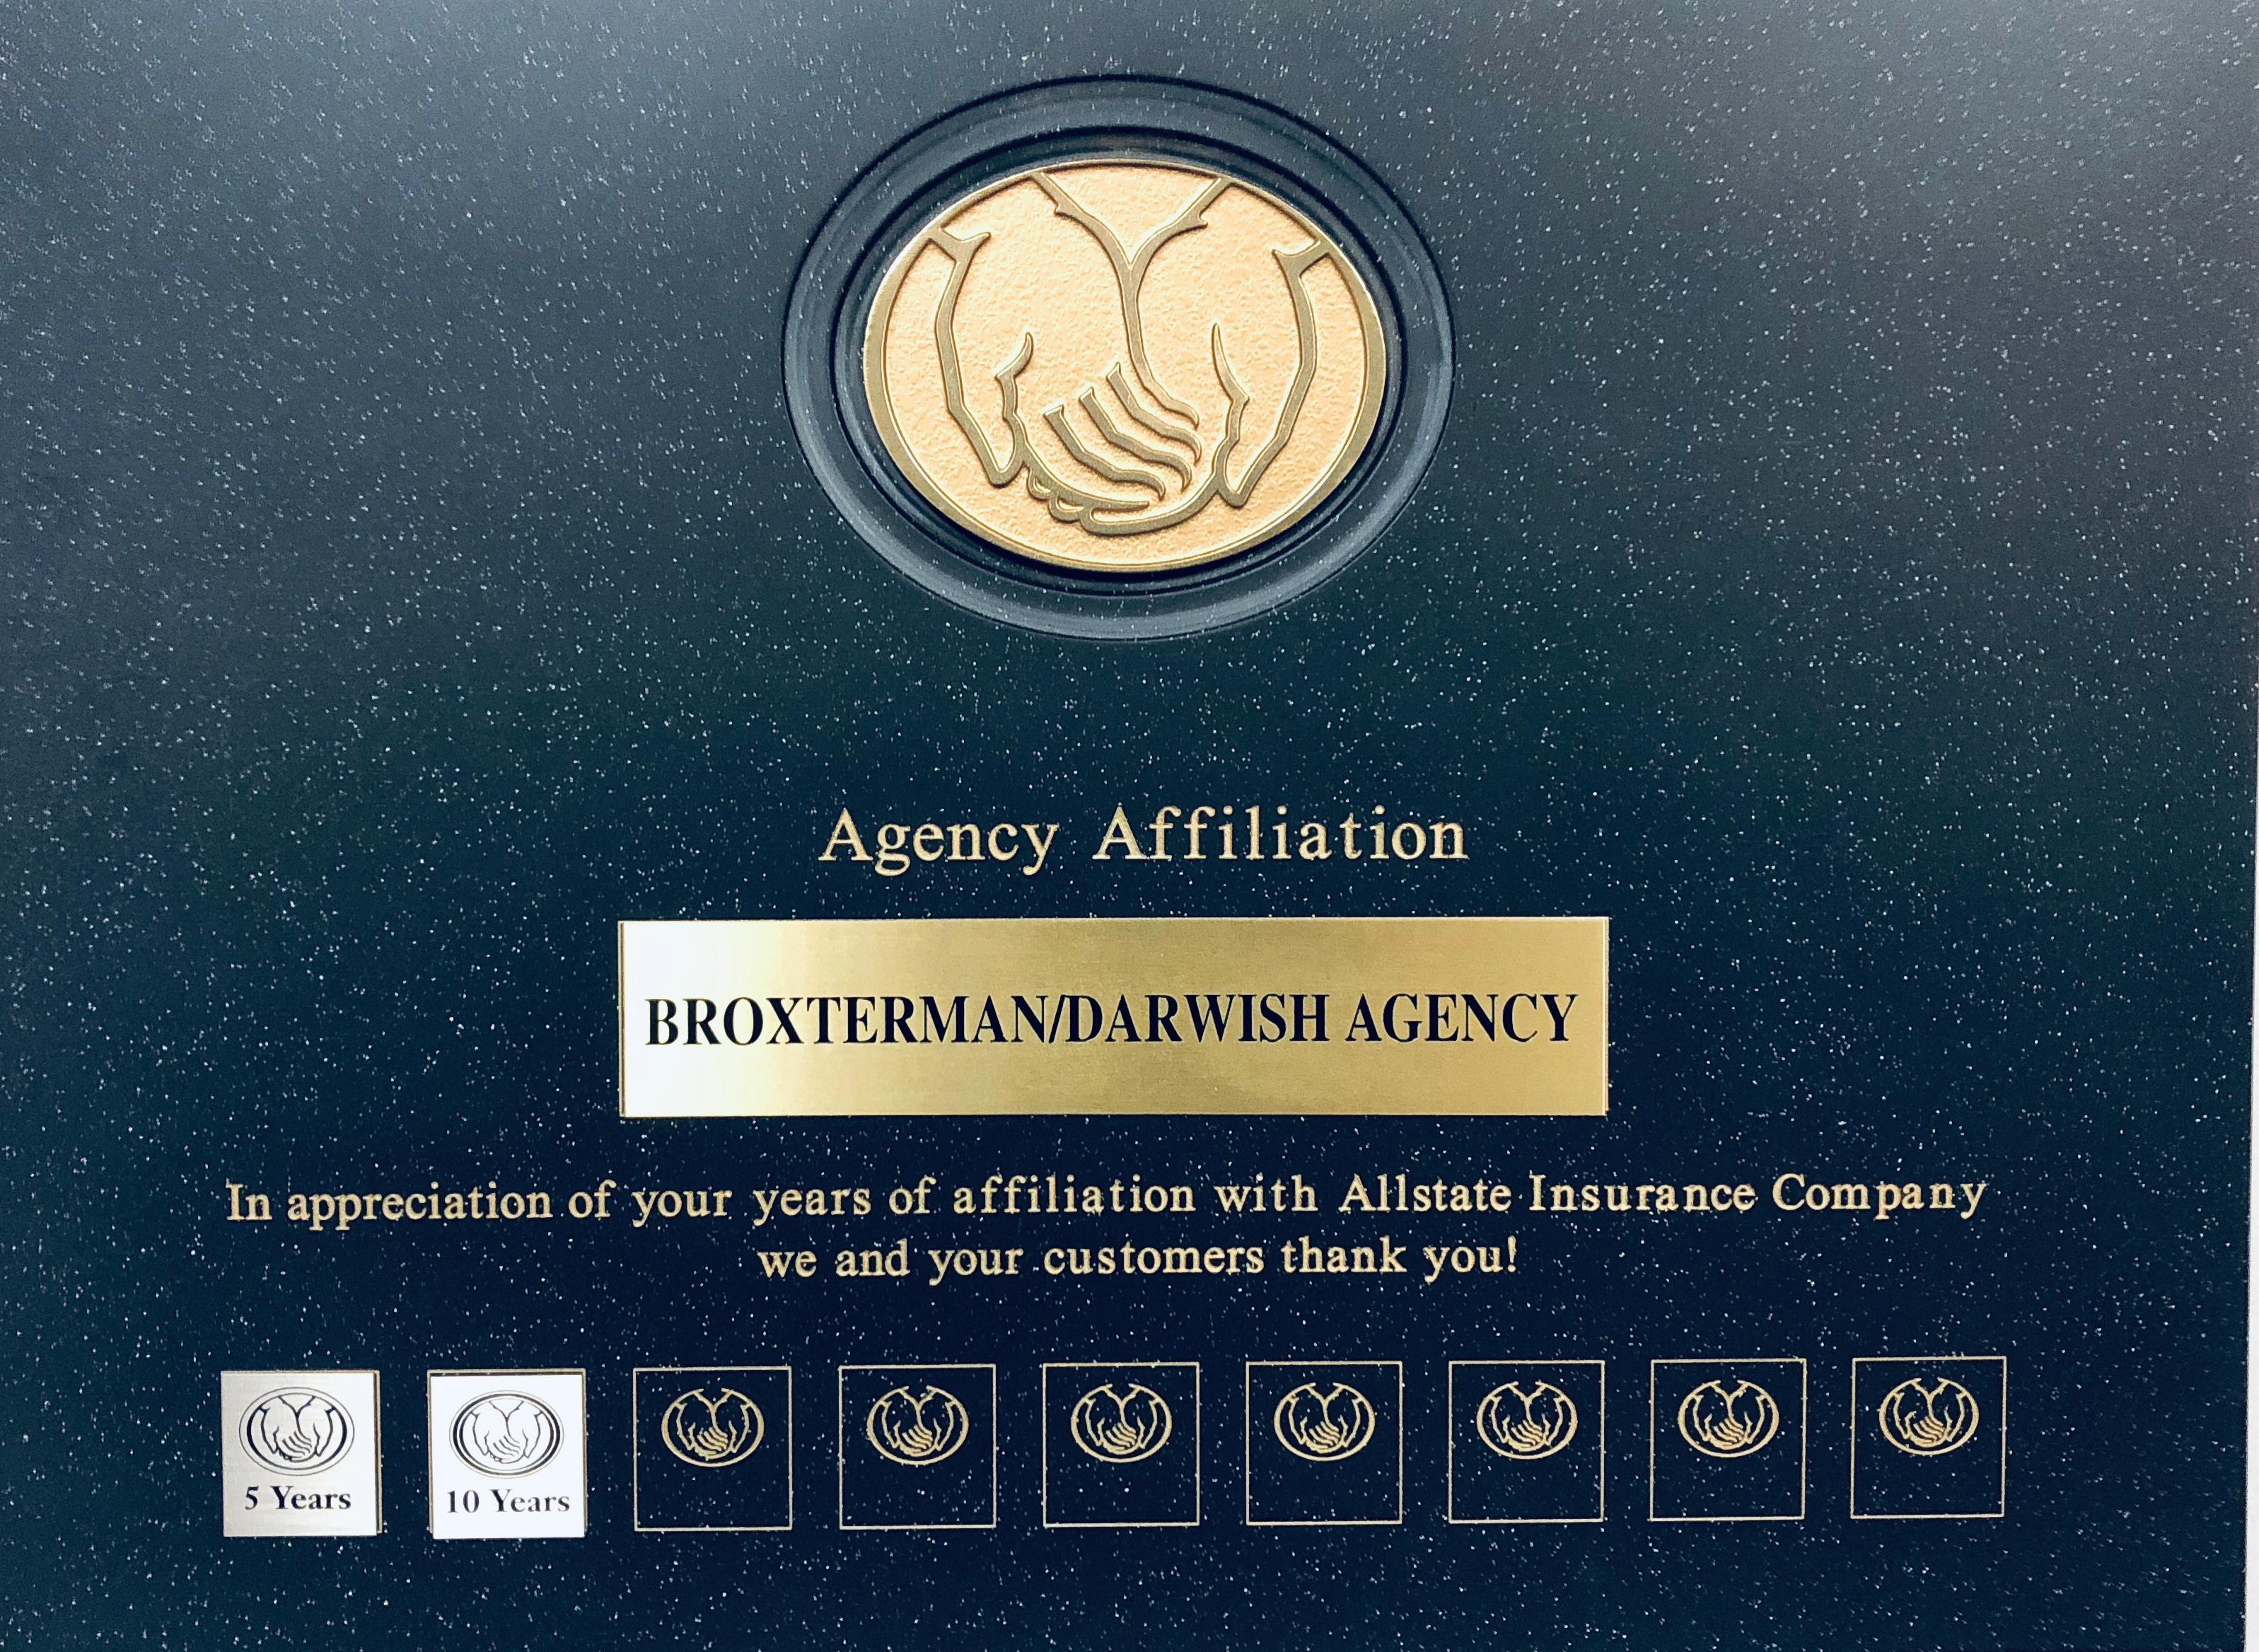 Charlie Broxterman: Allstate Insurance image 9